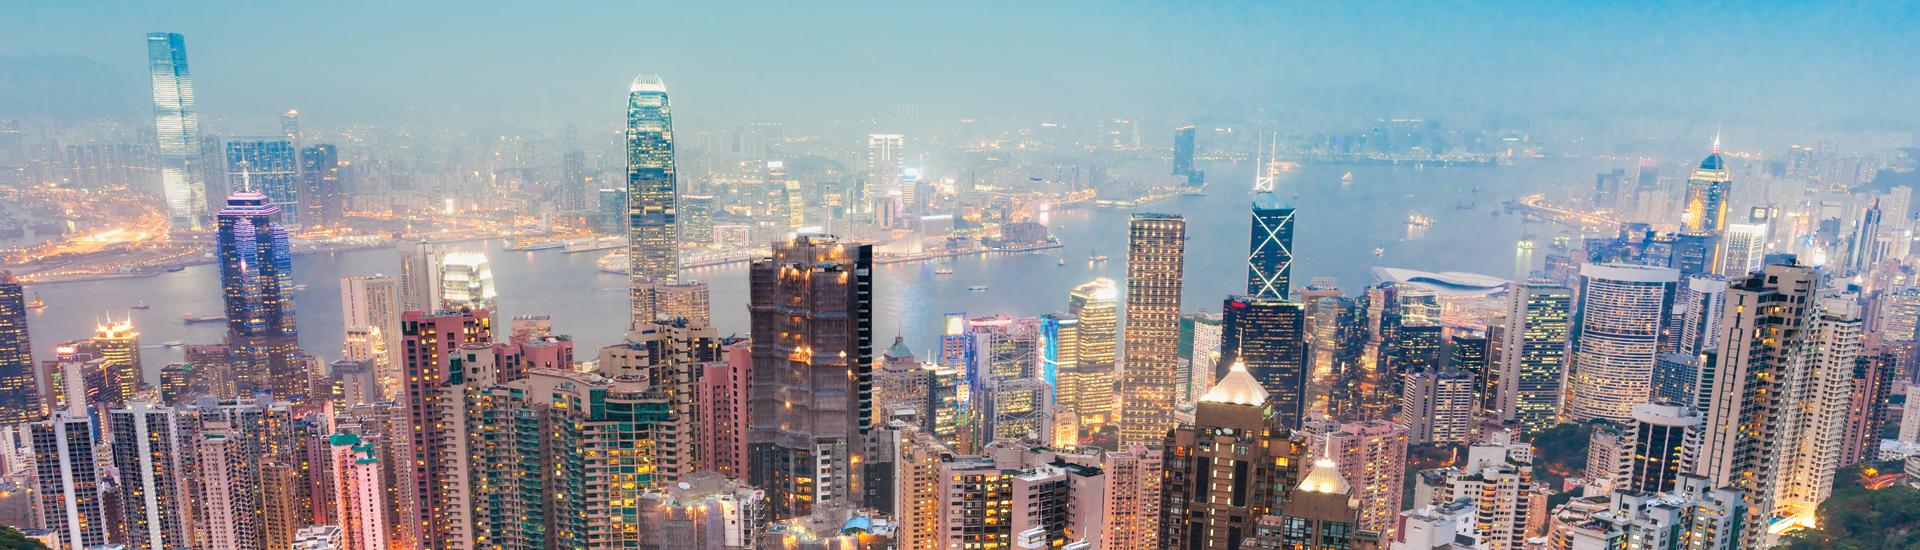 Intriguing novels set in Hong Kong